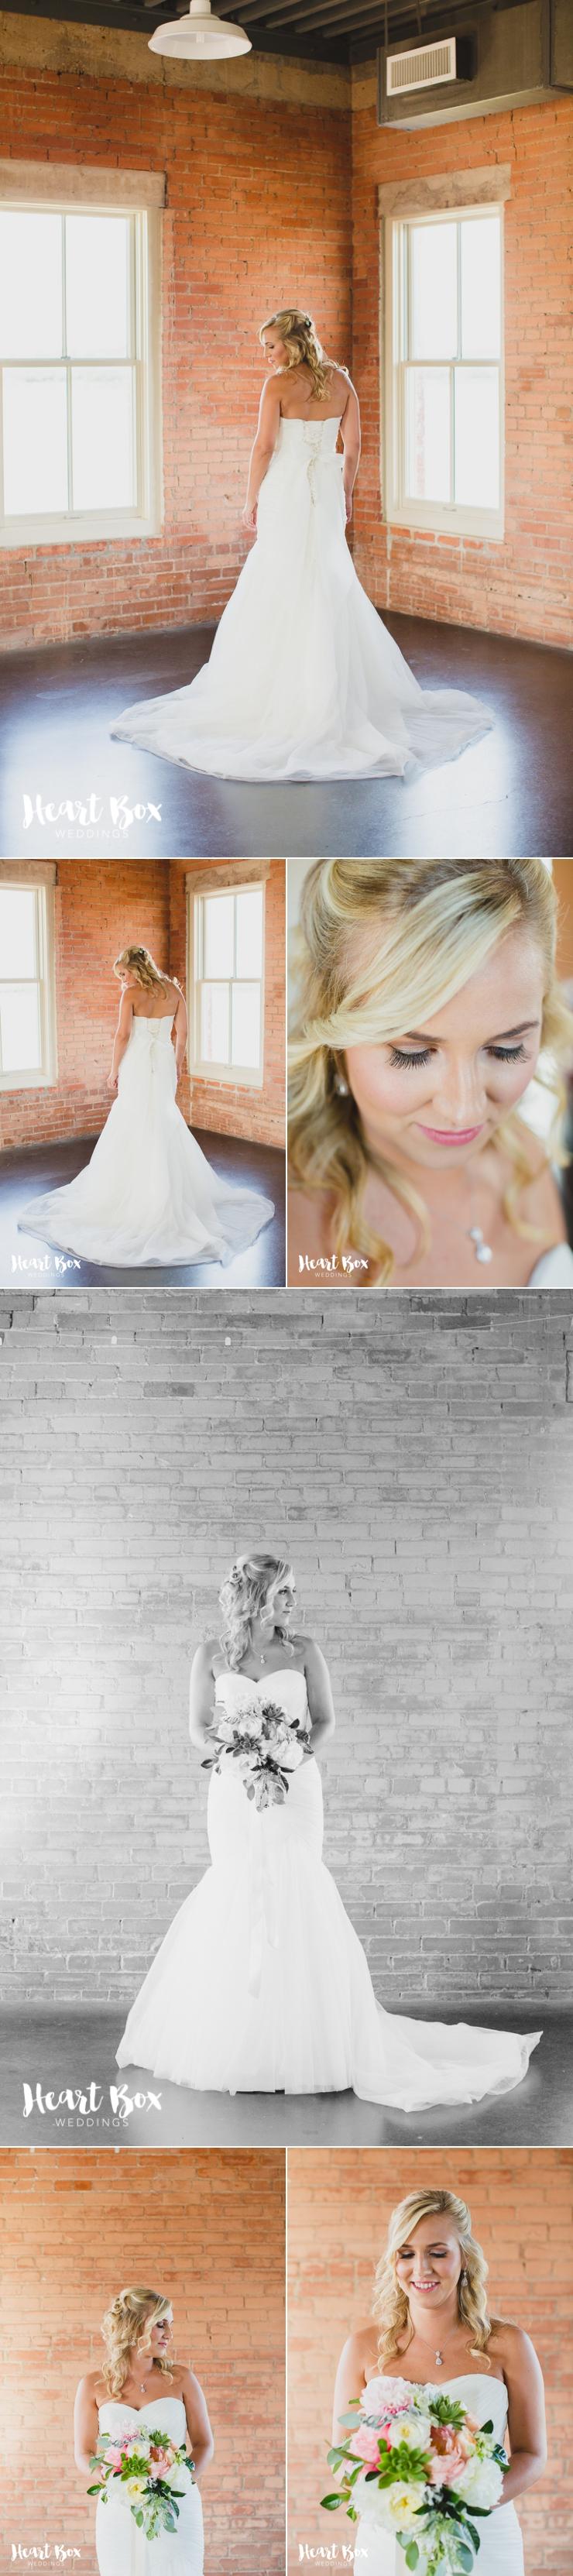 Gould Wedding Blog Collages 6.jpg